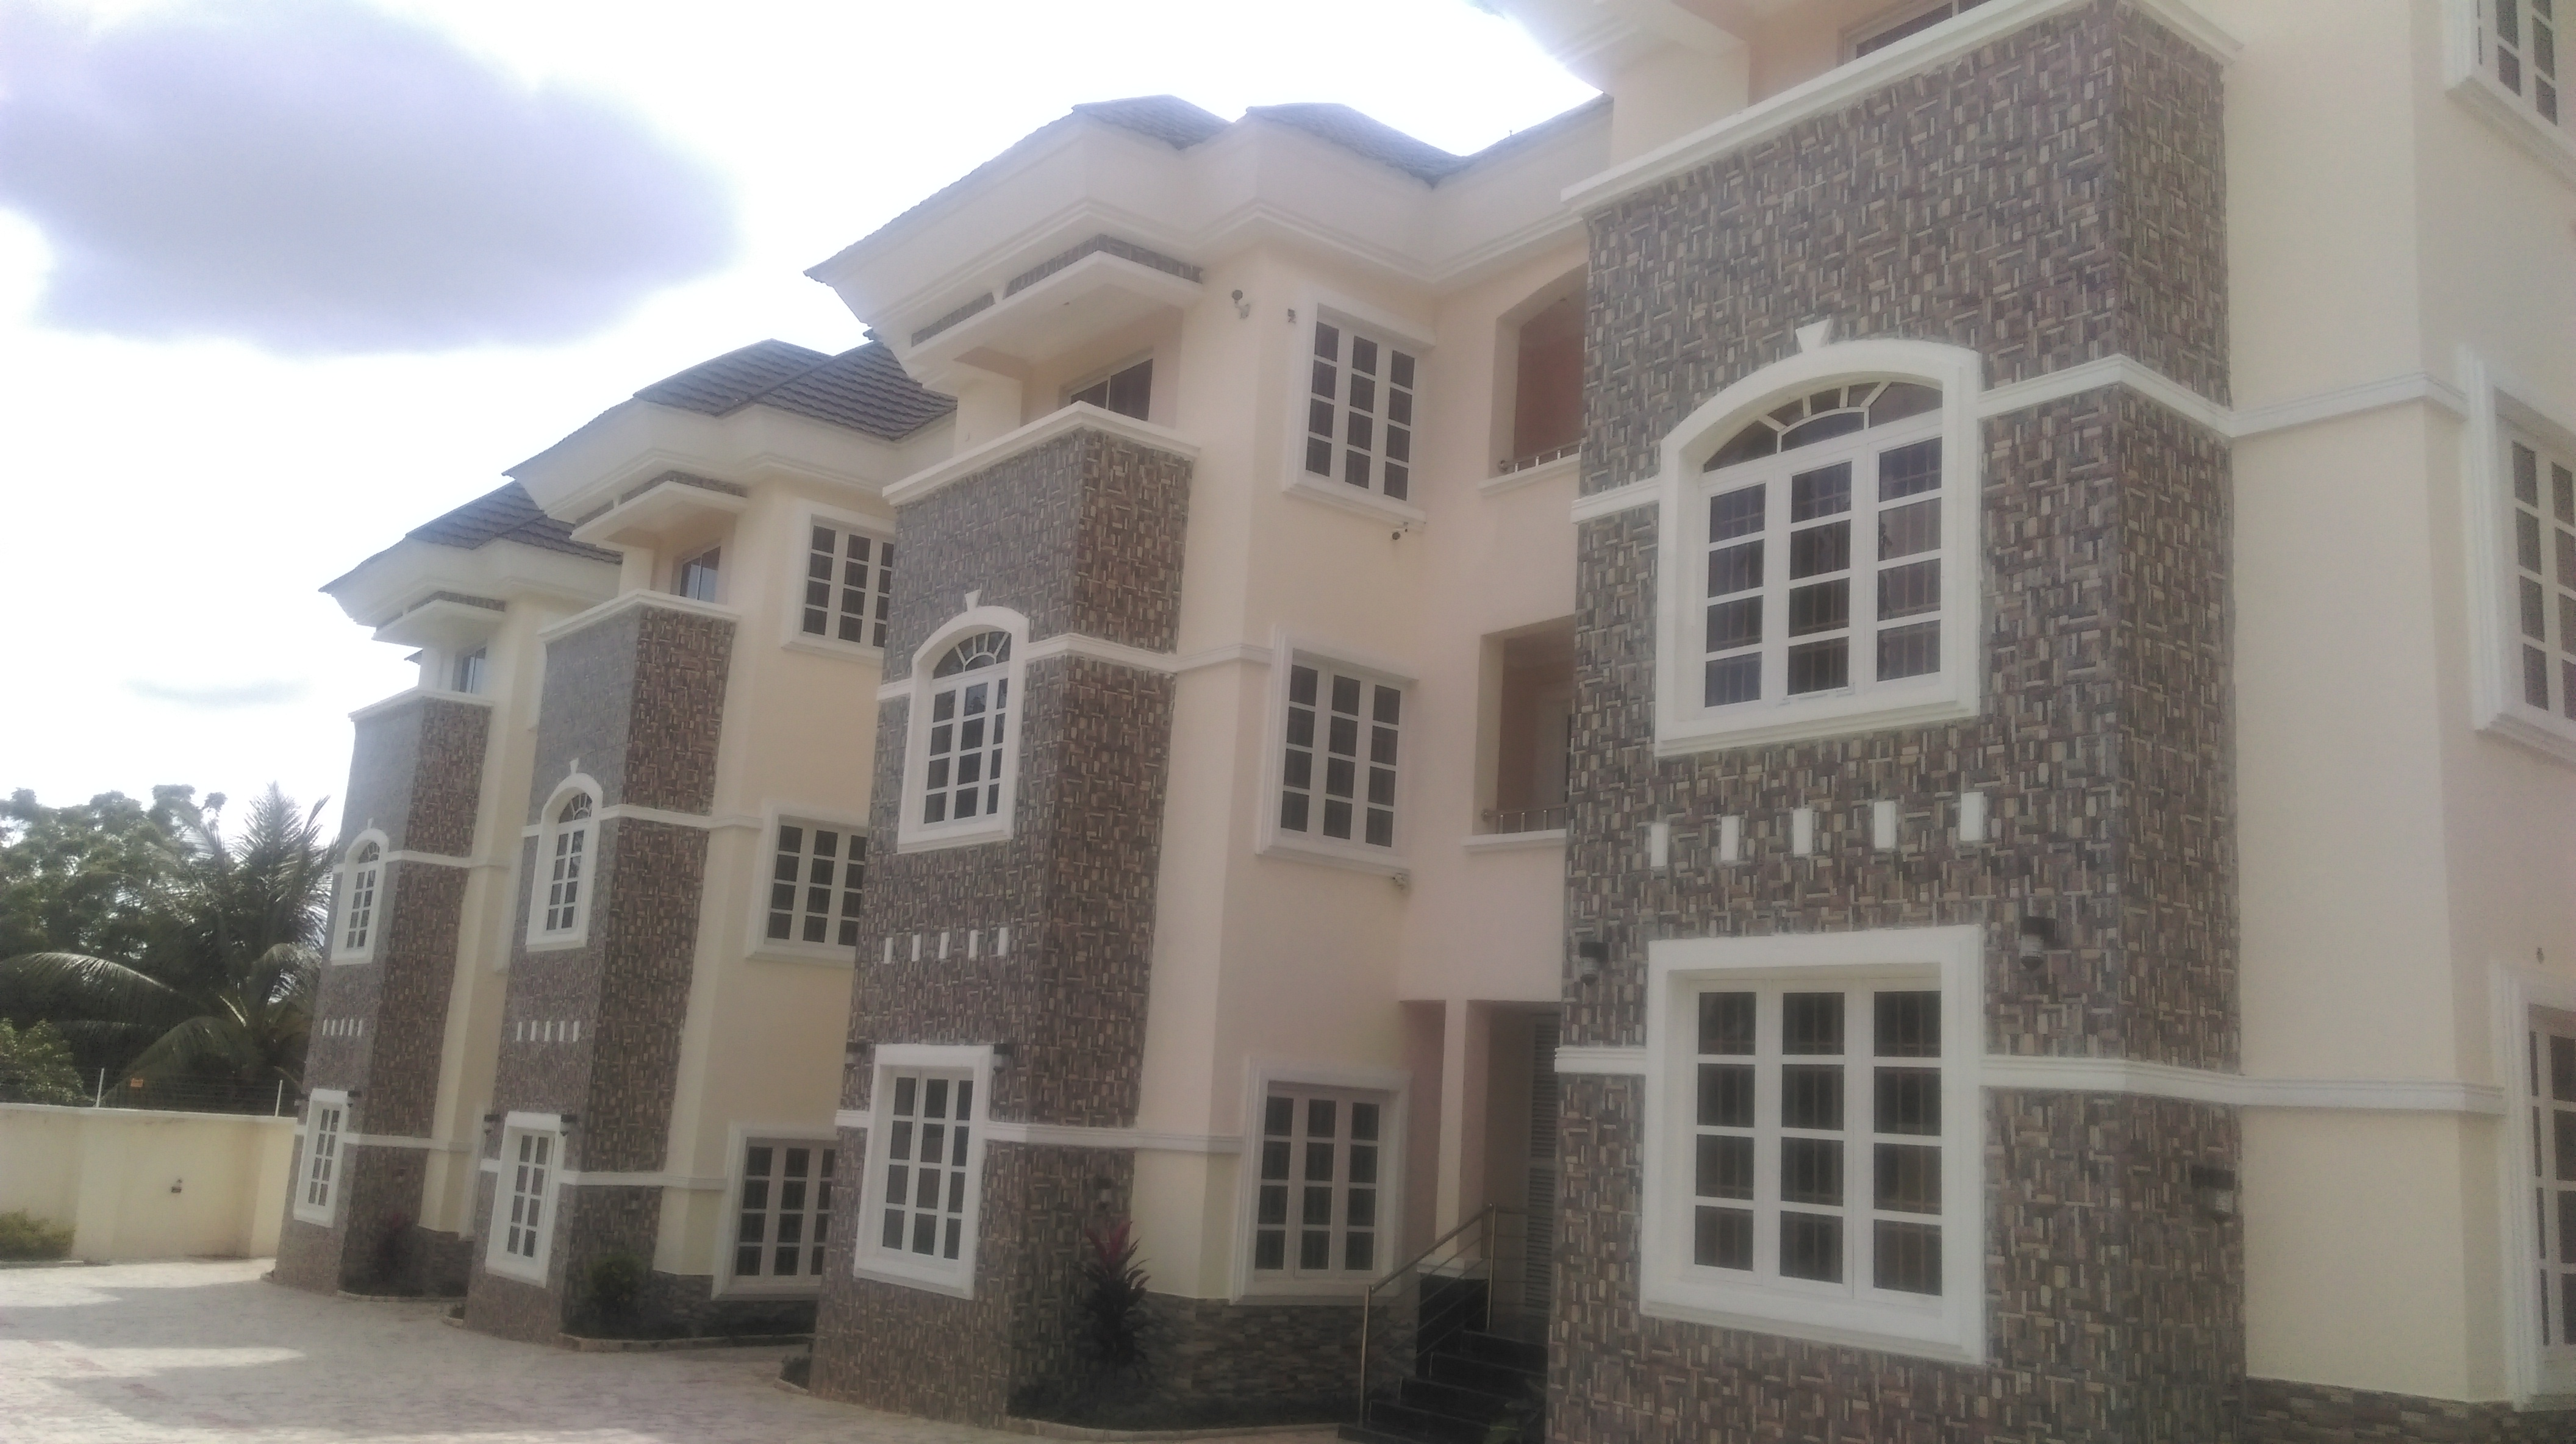 5 units of 4 bedroom duplex for rent abuja properties for Duplex units